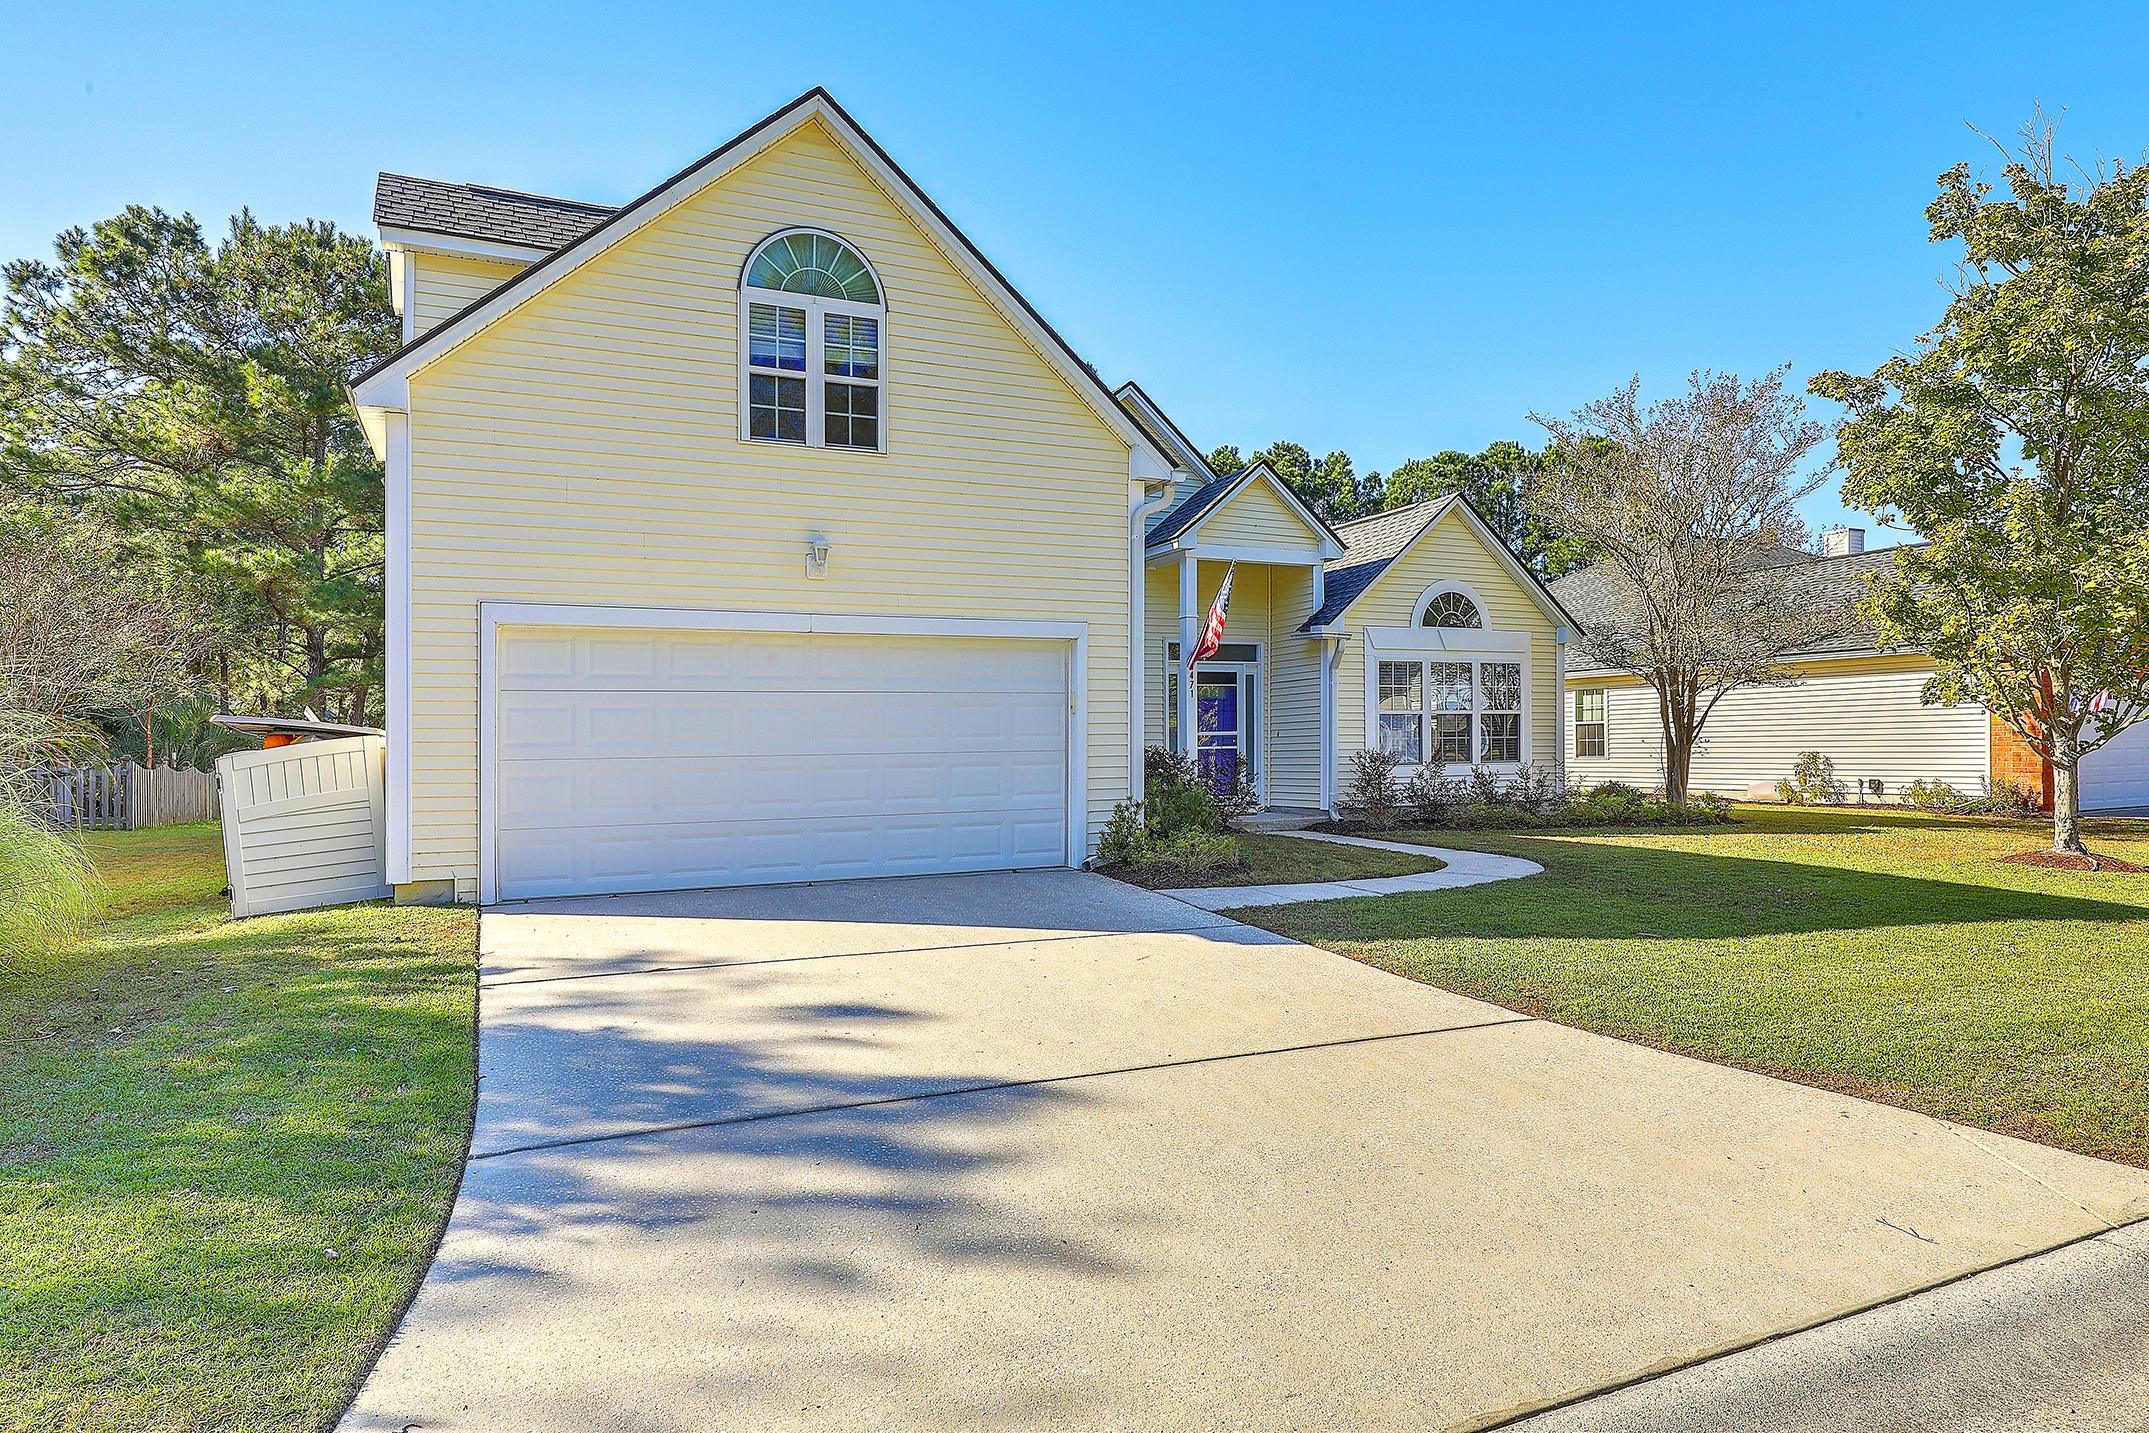 Dunes West Homes For Sale - 1471 Cypress Pointe, Mount Pleasant, SC - 29